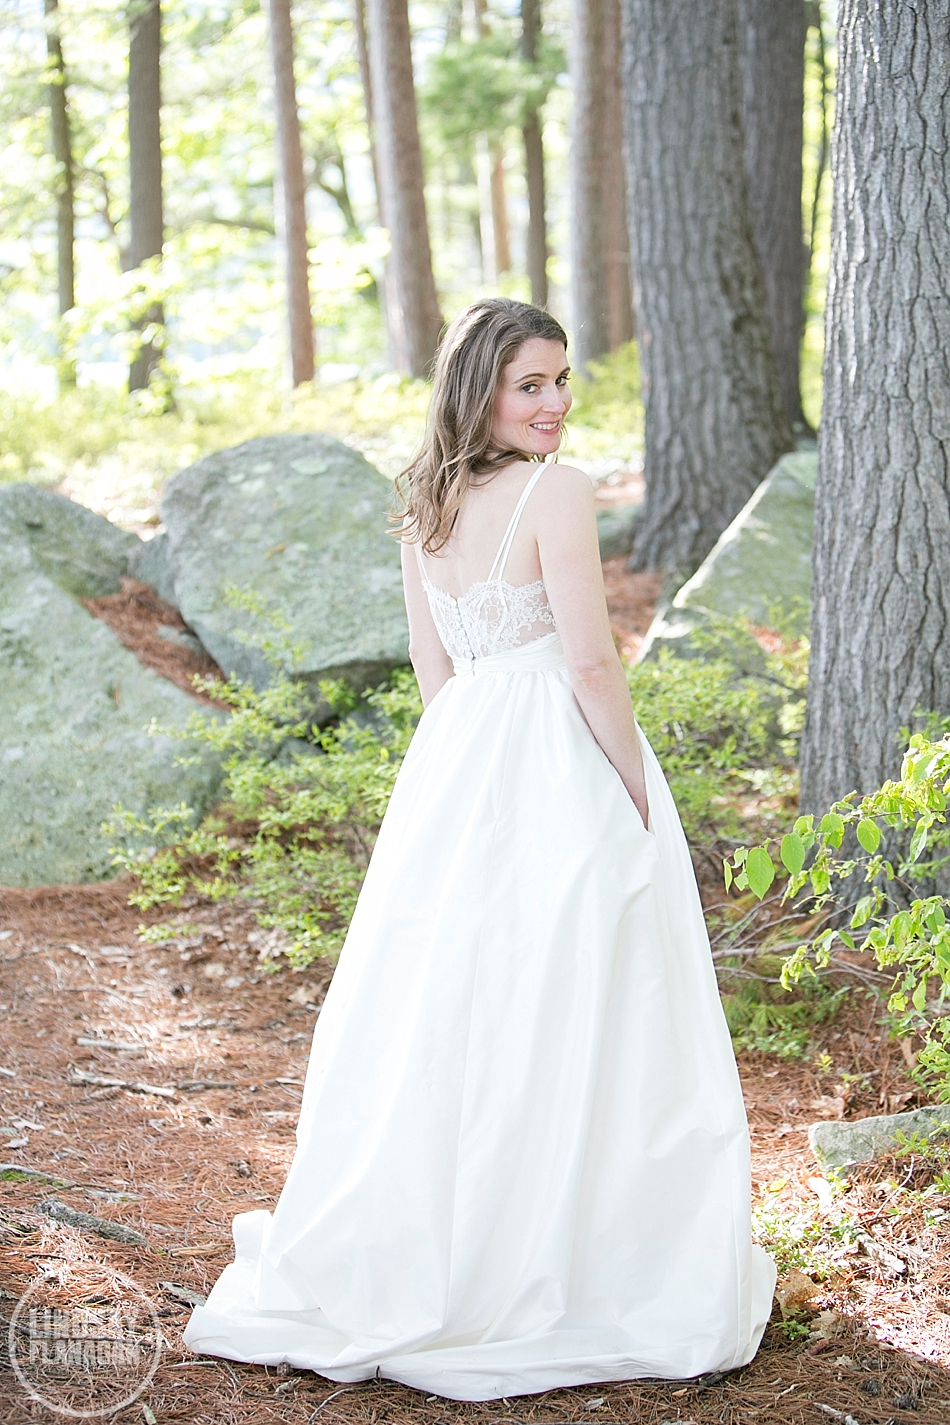 Rockywold-Deephaven-Camp-Wedding-Bride-Portrait